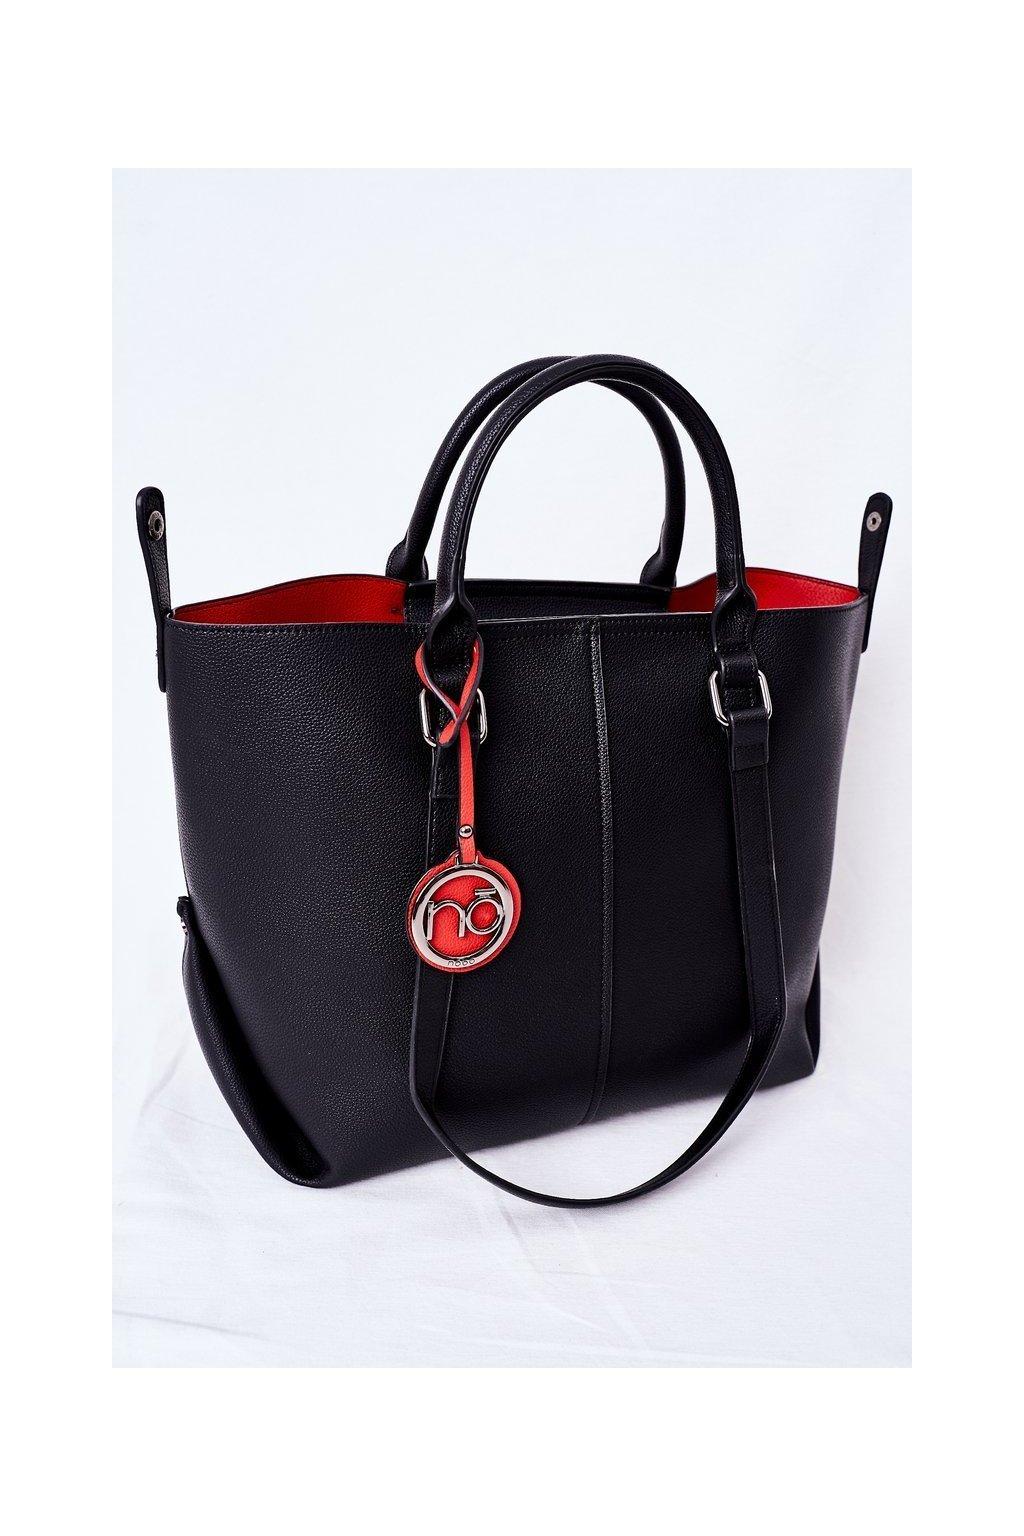 Dámska kabelka čierna kód kabelky NBAG-K2300-C020 BLACK/RED